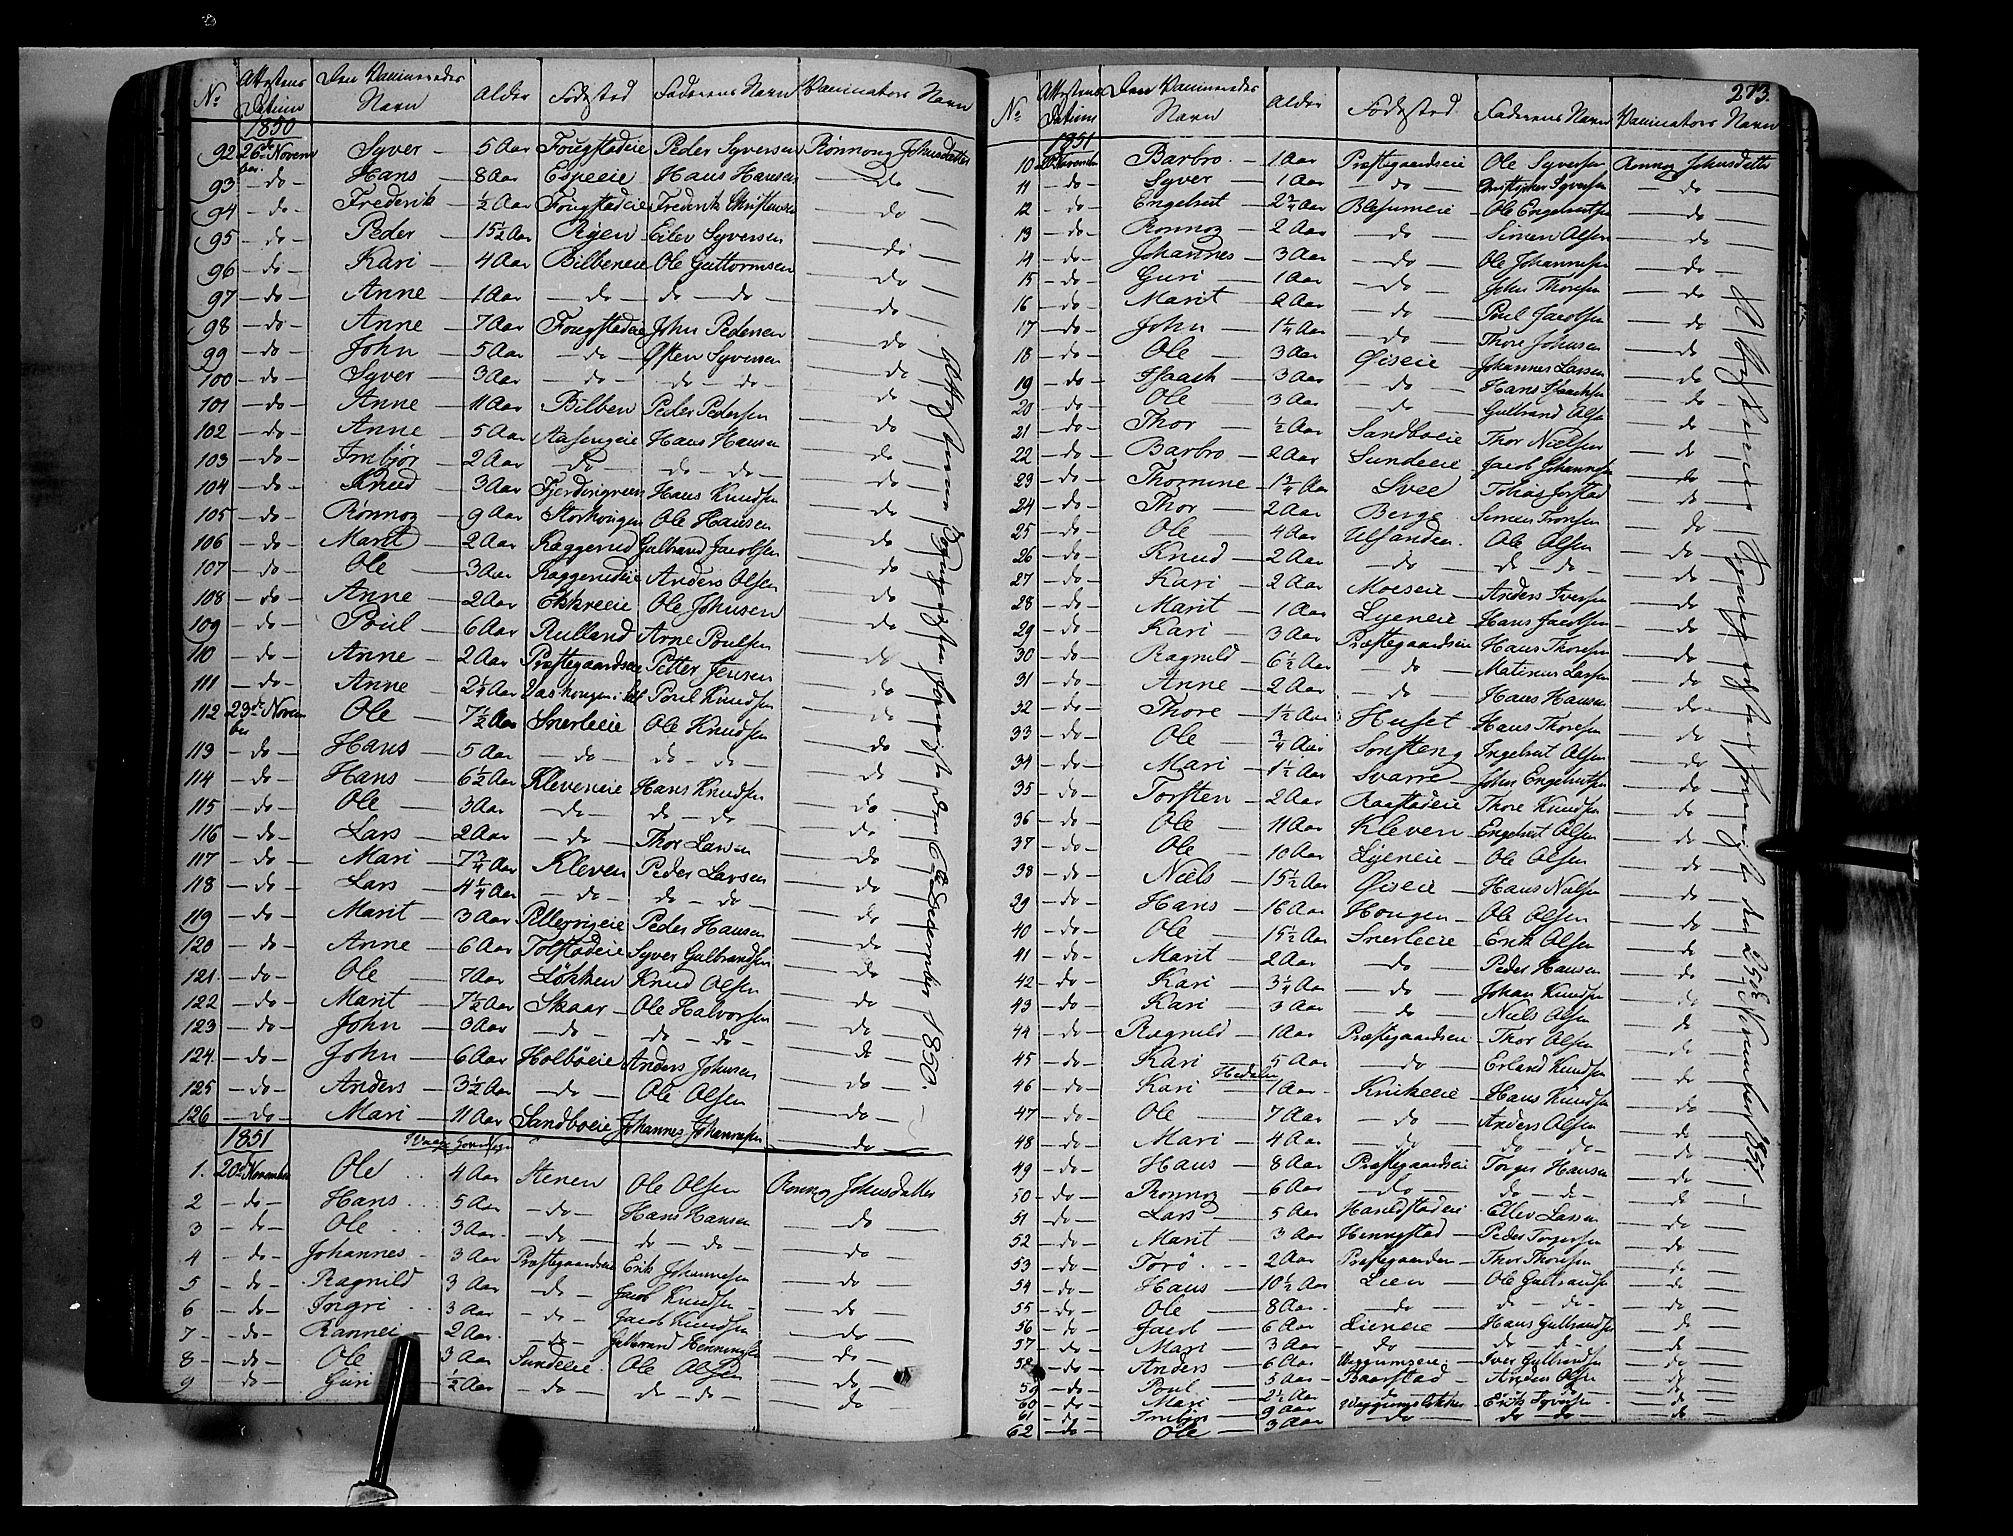 SAH, Vågå prestekontor, Ministerialbok nr. 5 /1, 1842-1856, s. 273